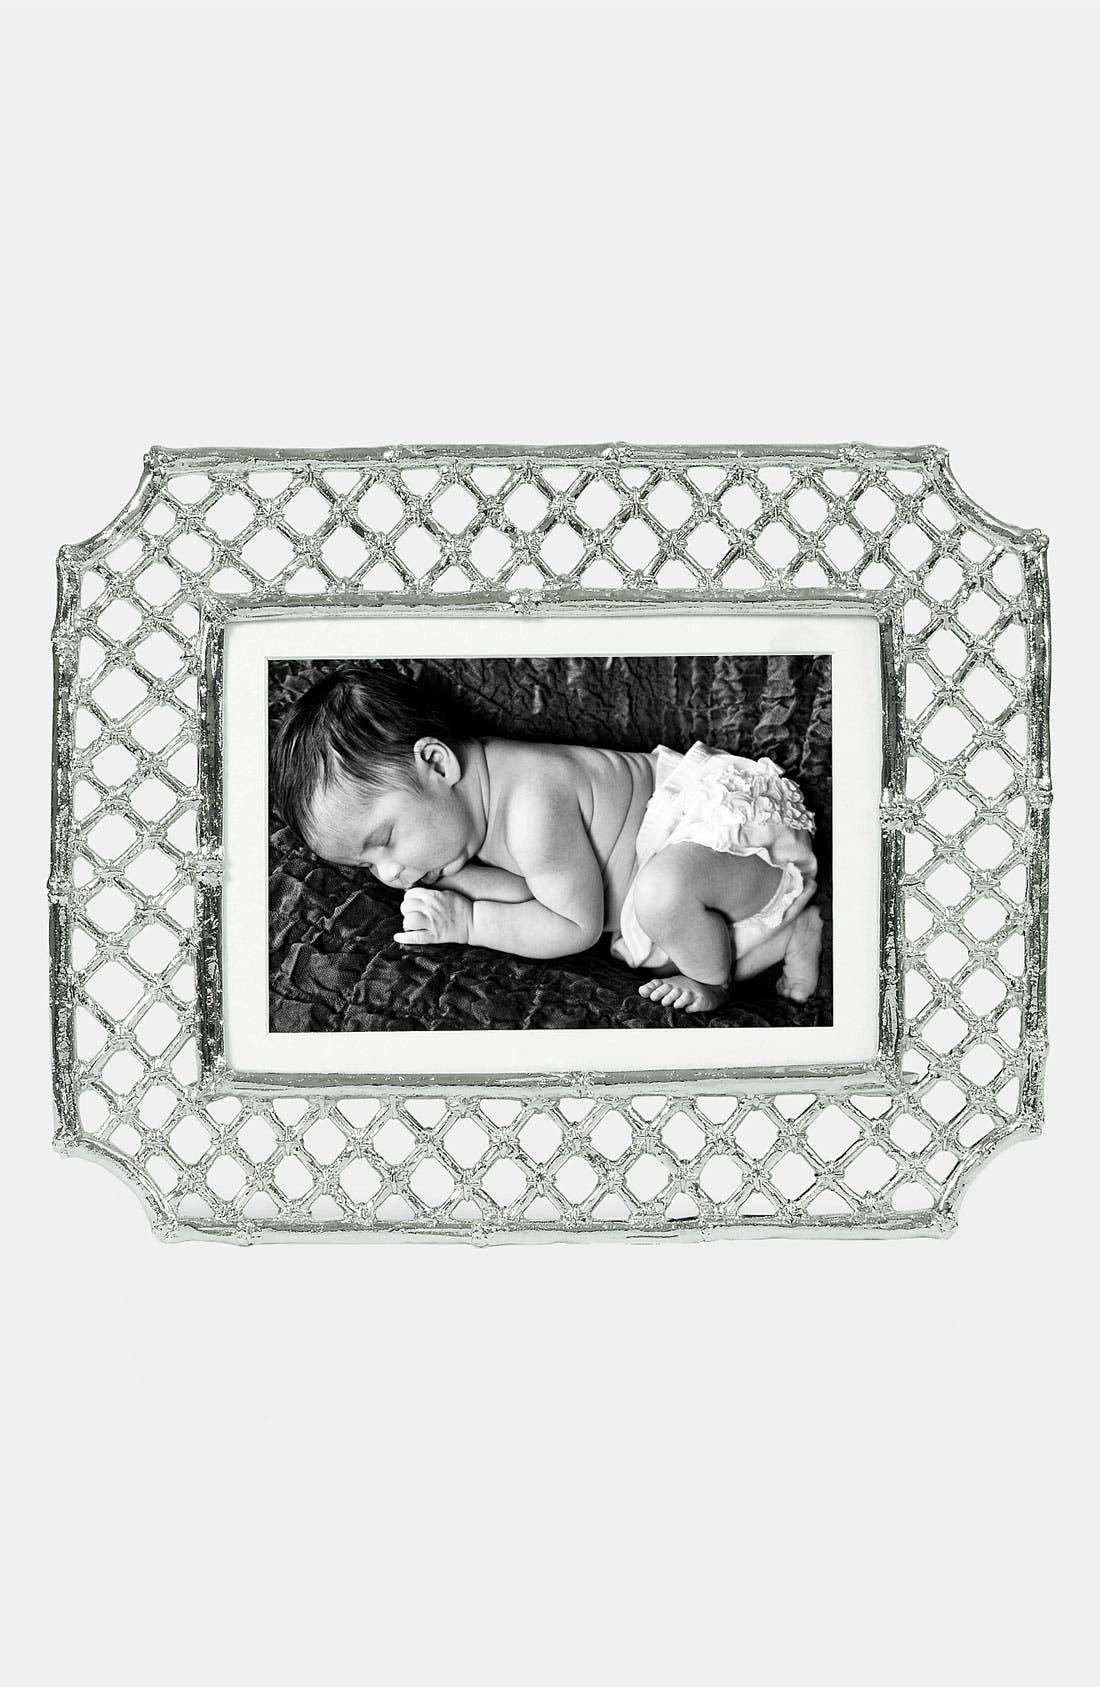 Alternate Image 1 Selected - Michael Aram 'Bamboo Lattice' Convertible Picture Frame